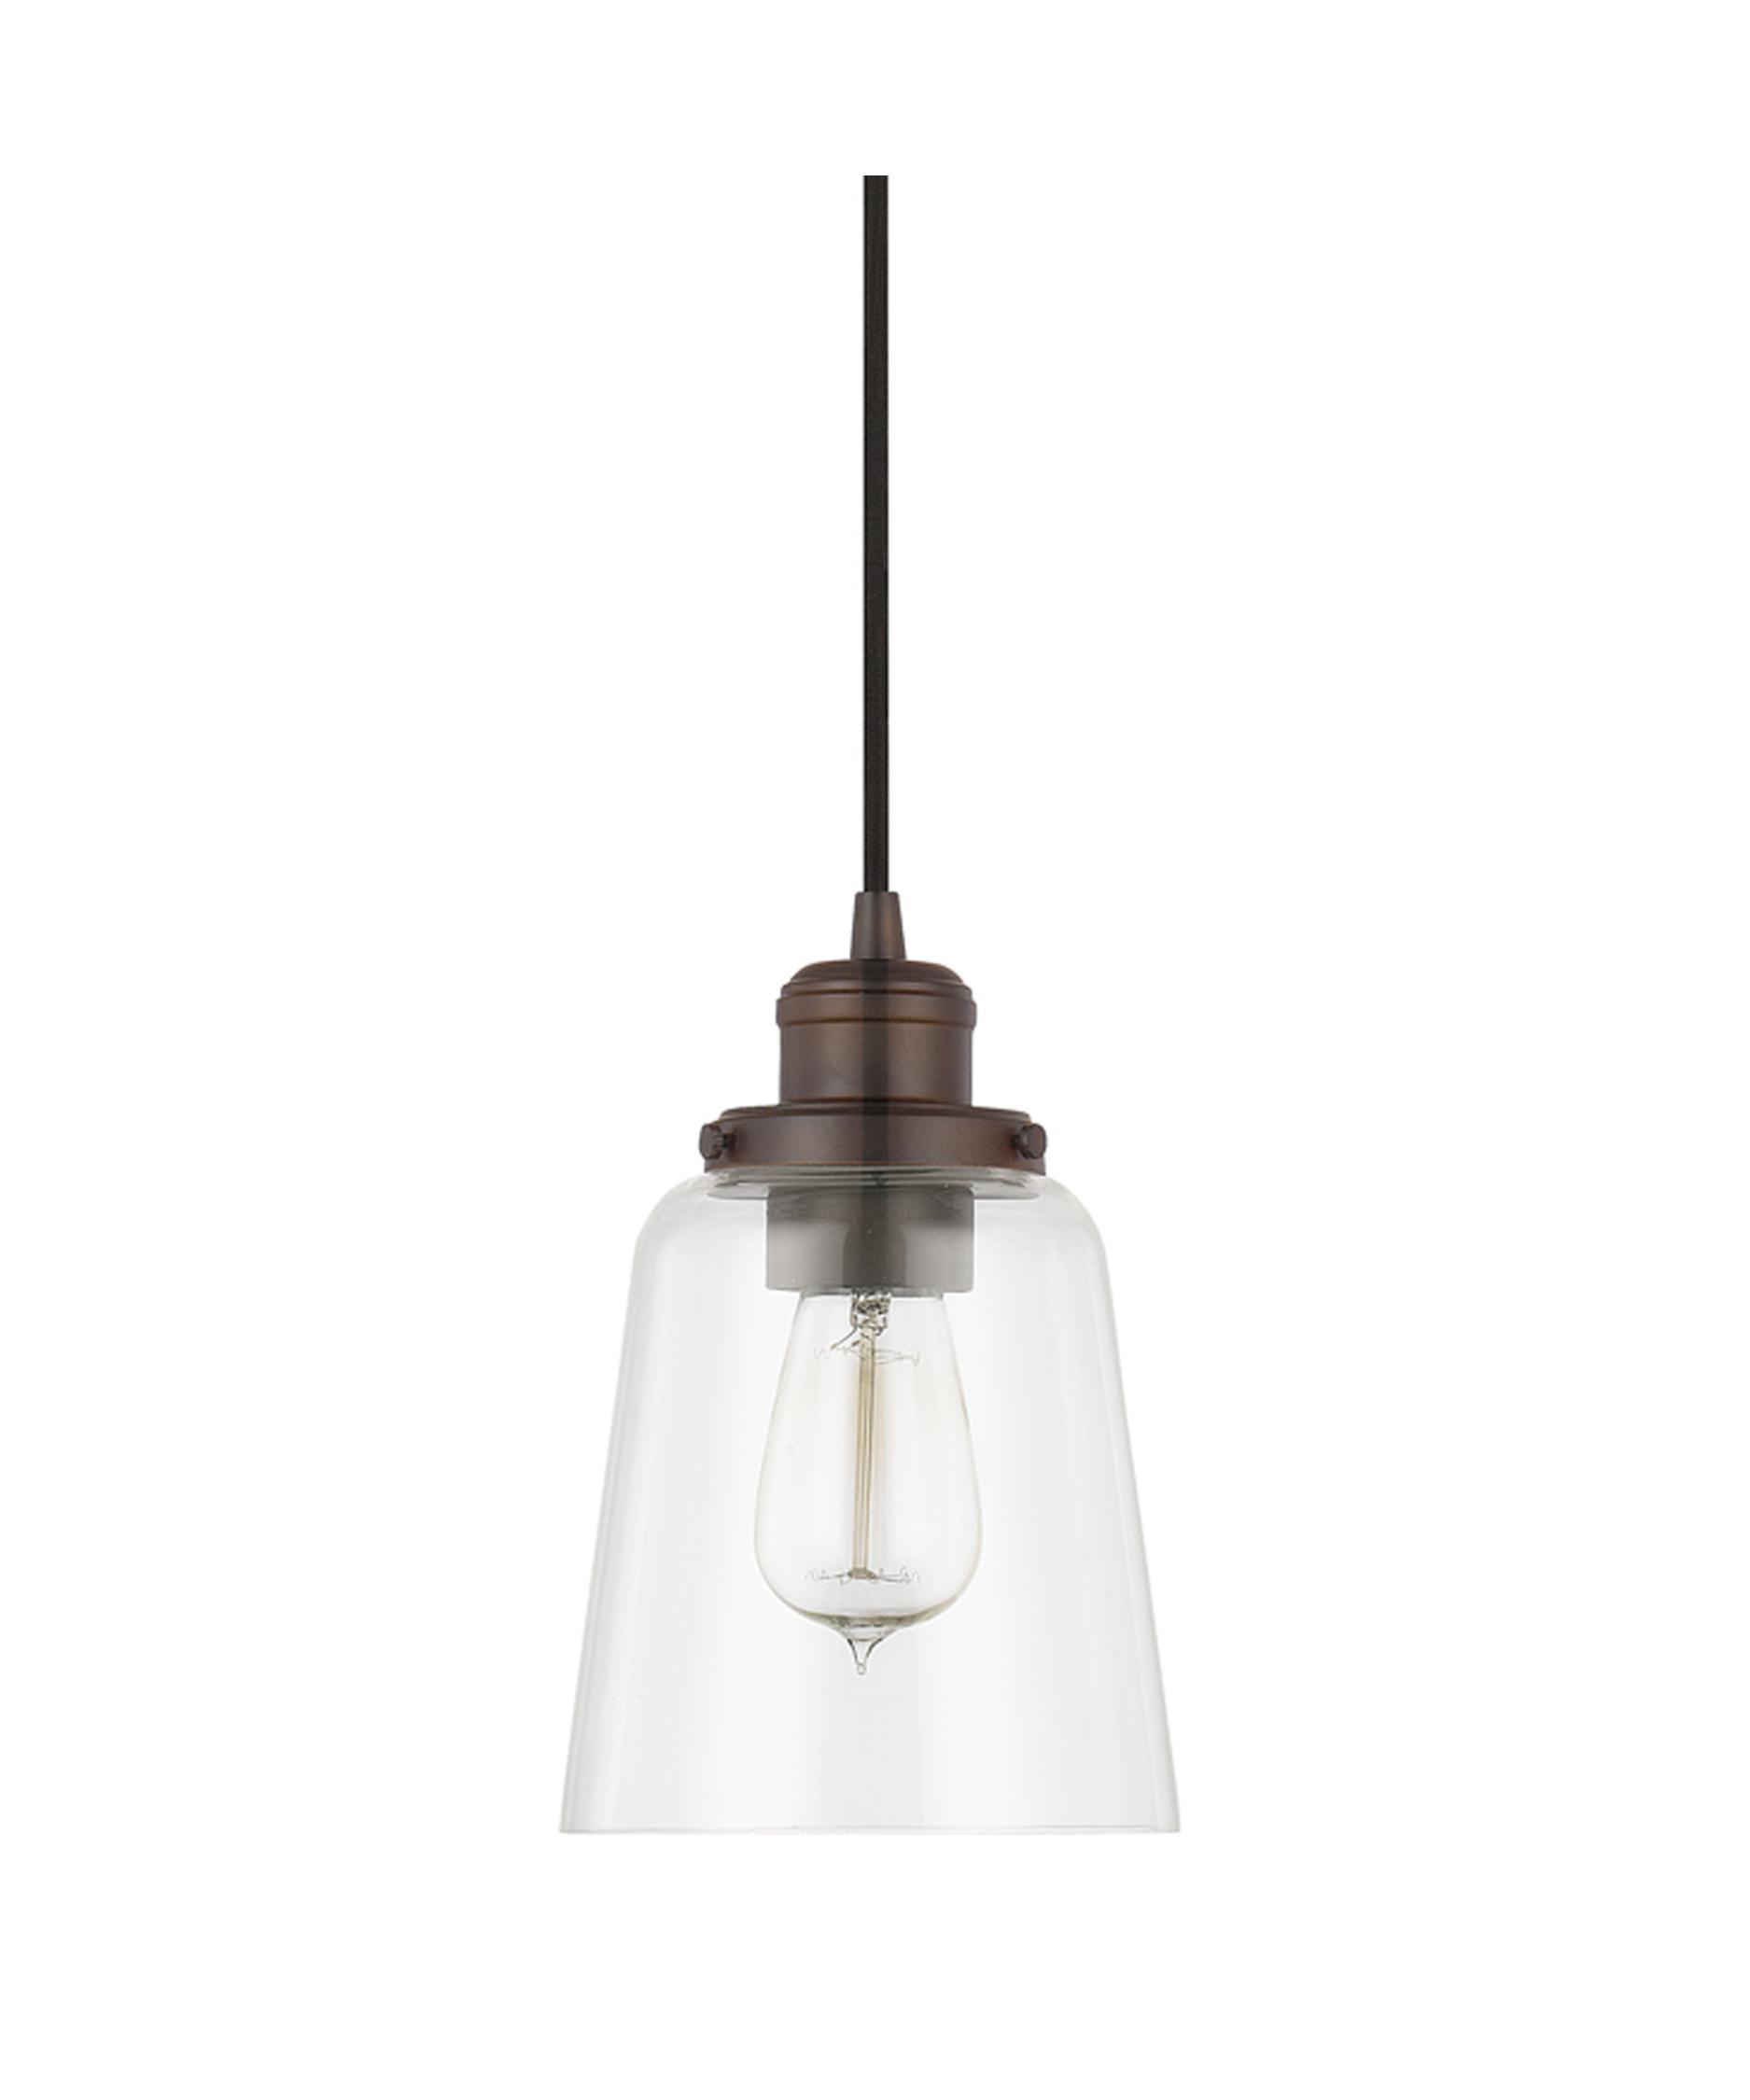 capital lighting 6 inch wide 1 light mini pendant capitol lighting - Capital Lighting